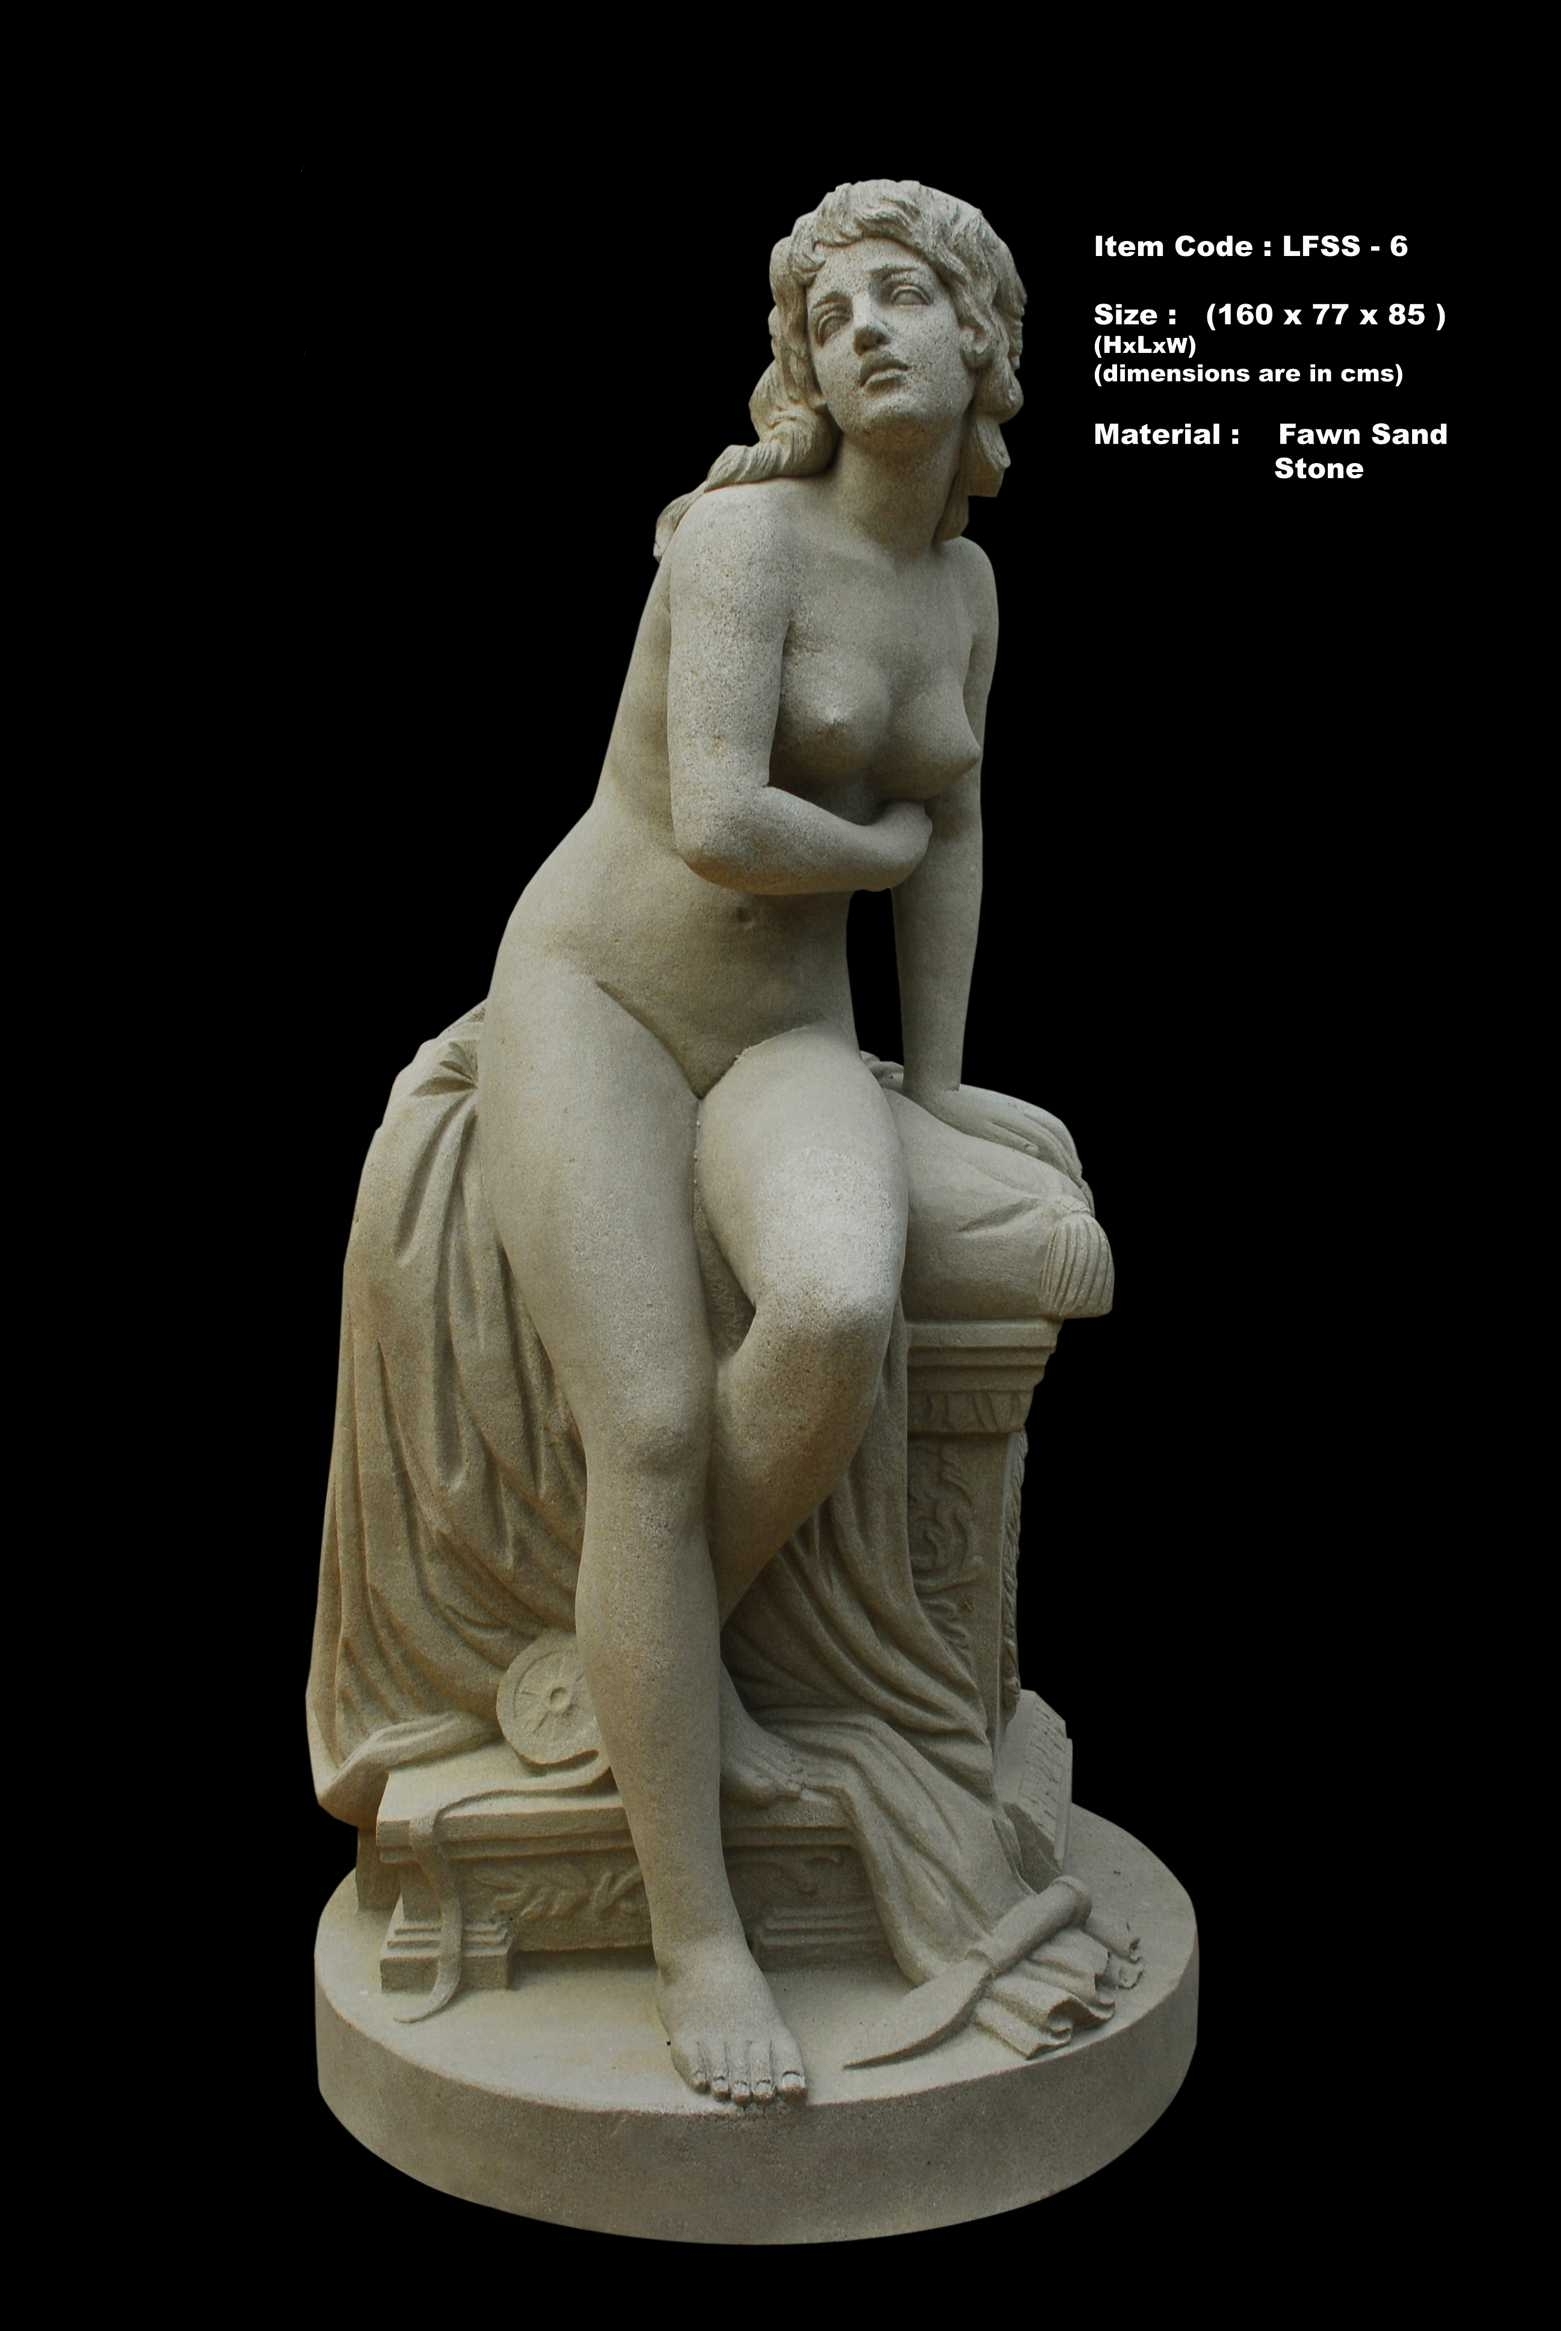 Lifesize Sandstone Human Statue